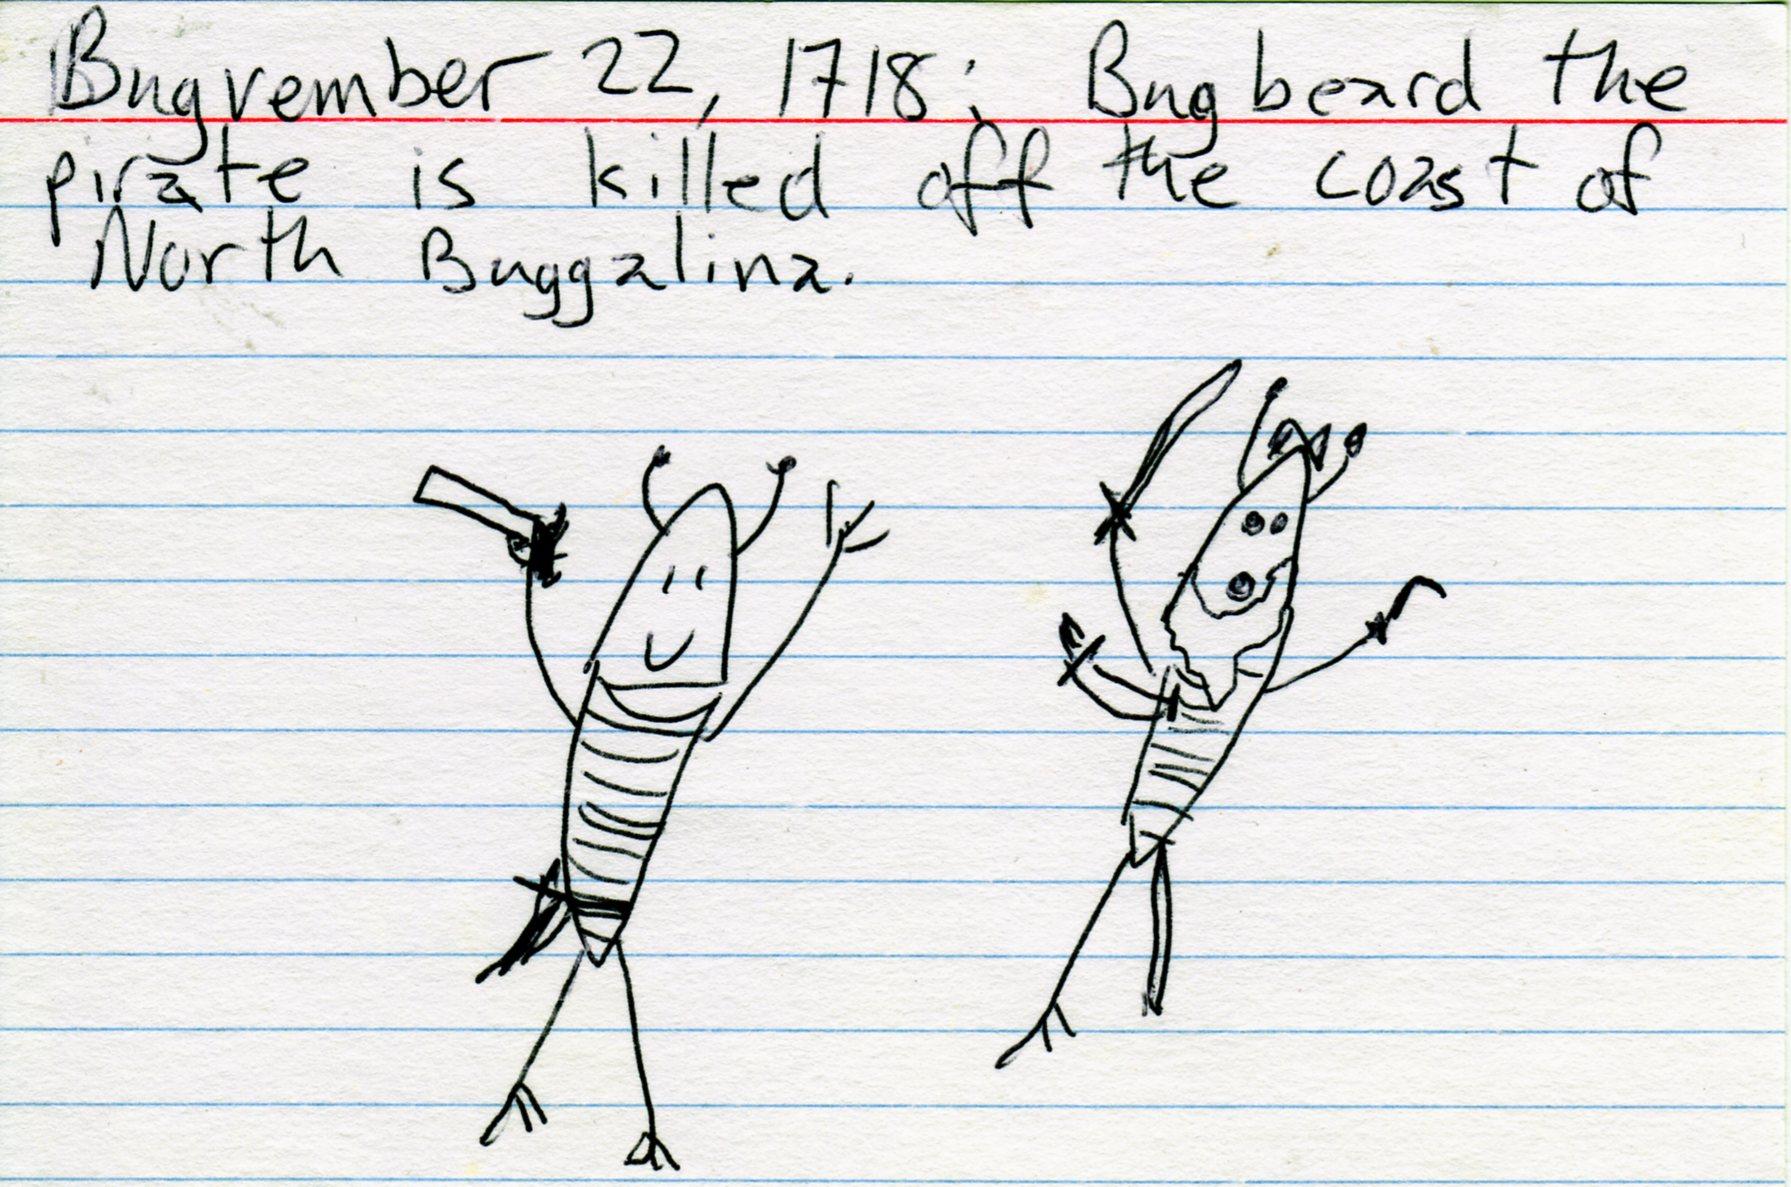 bugbeard [click to embiggen]